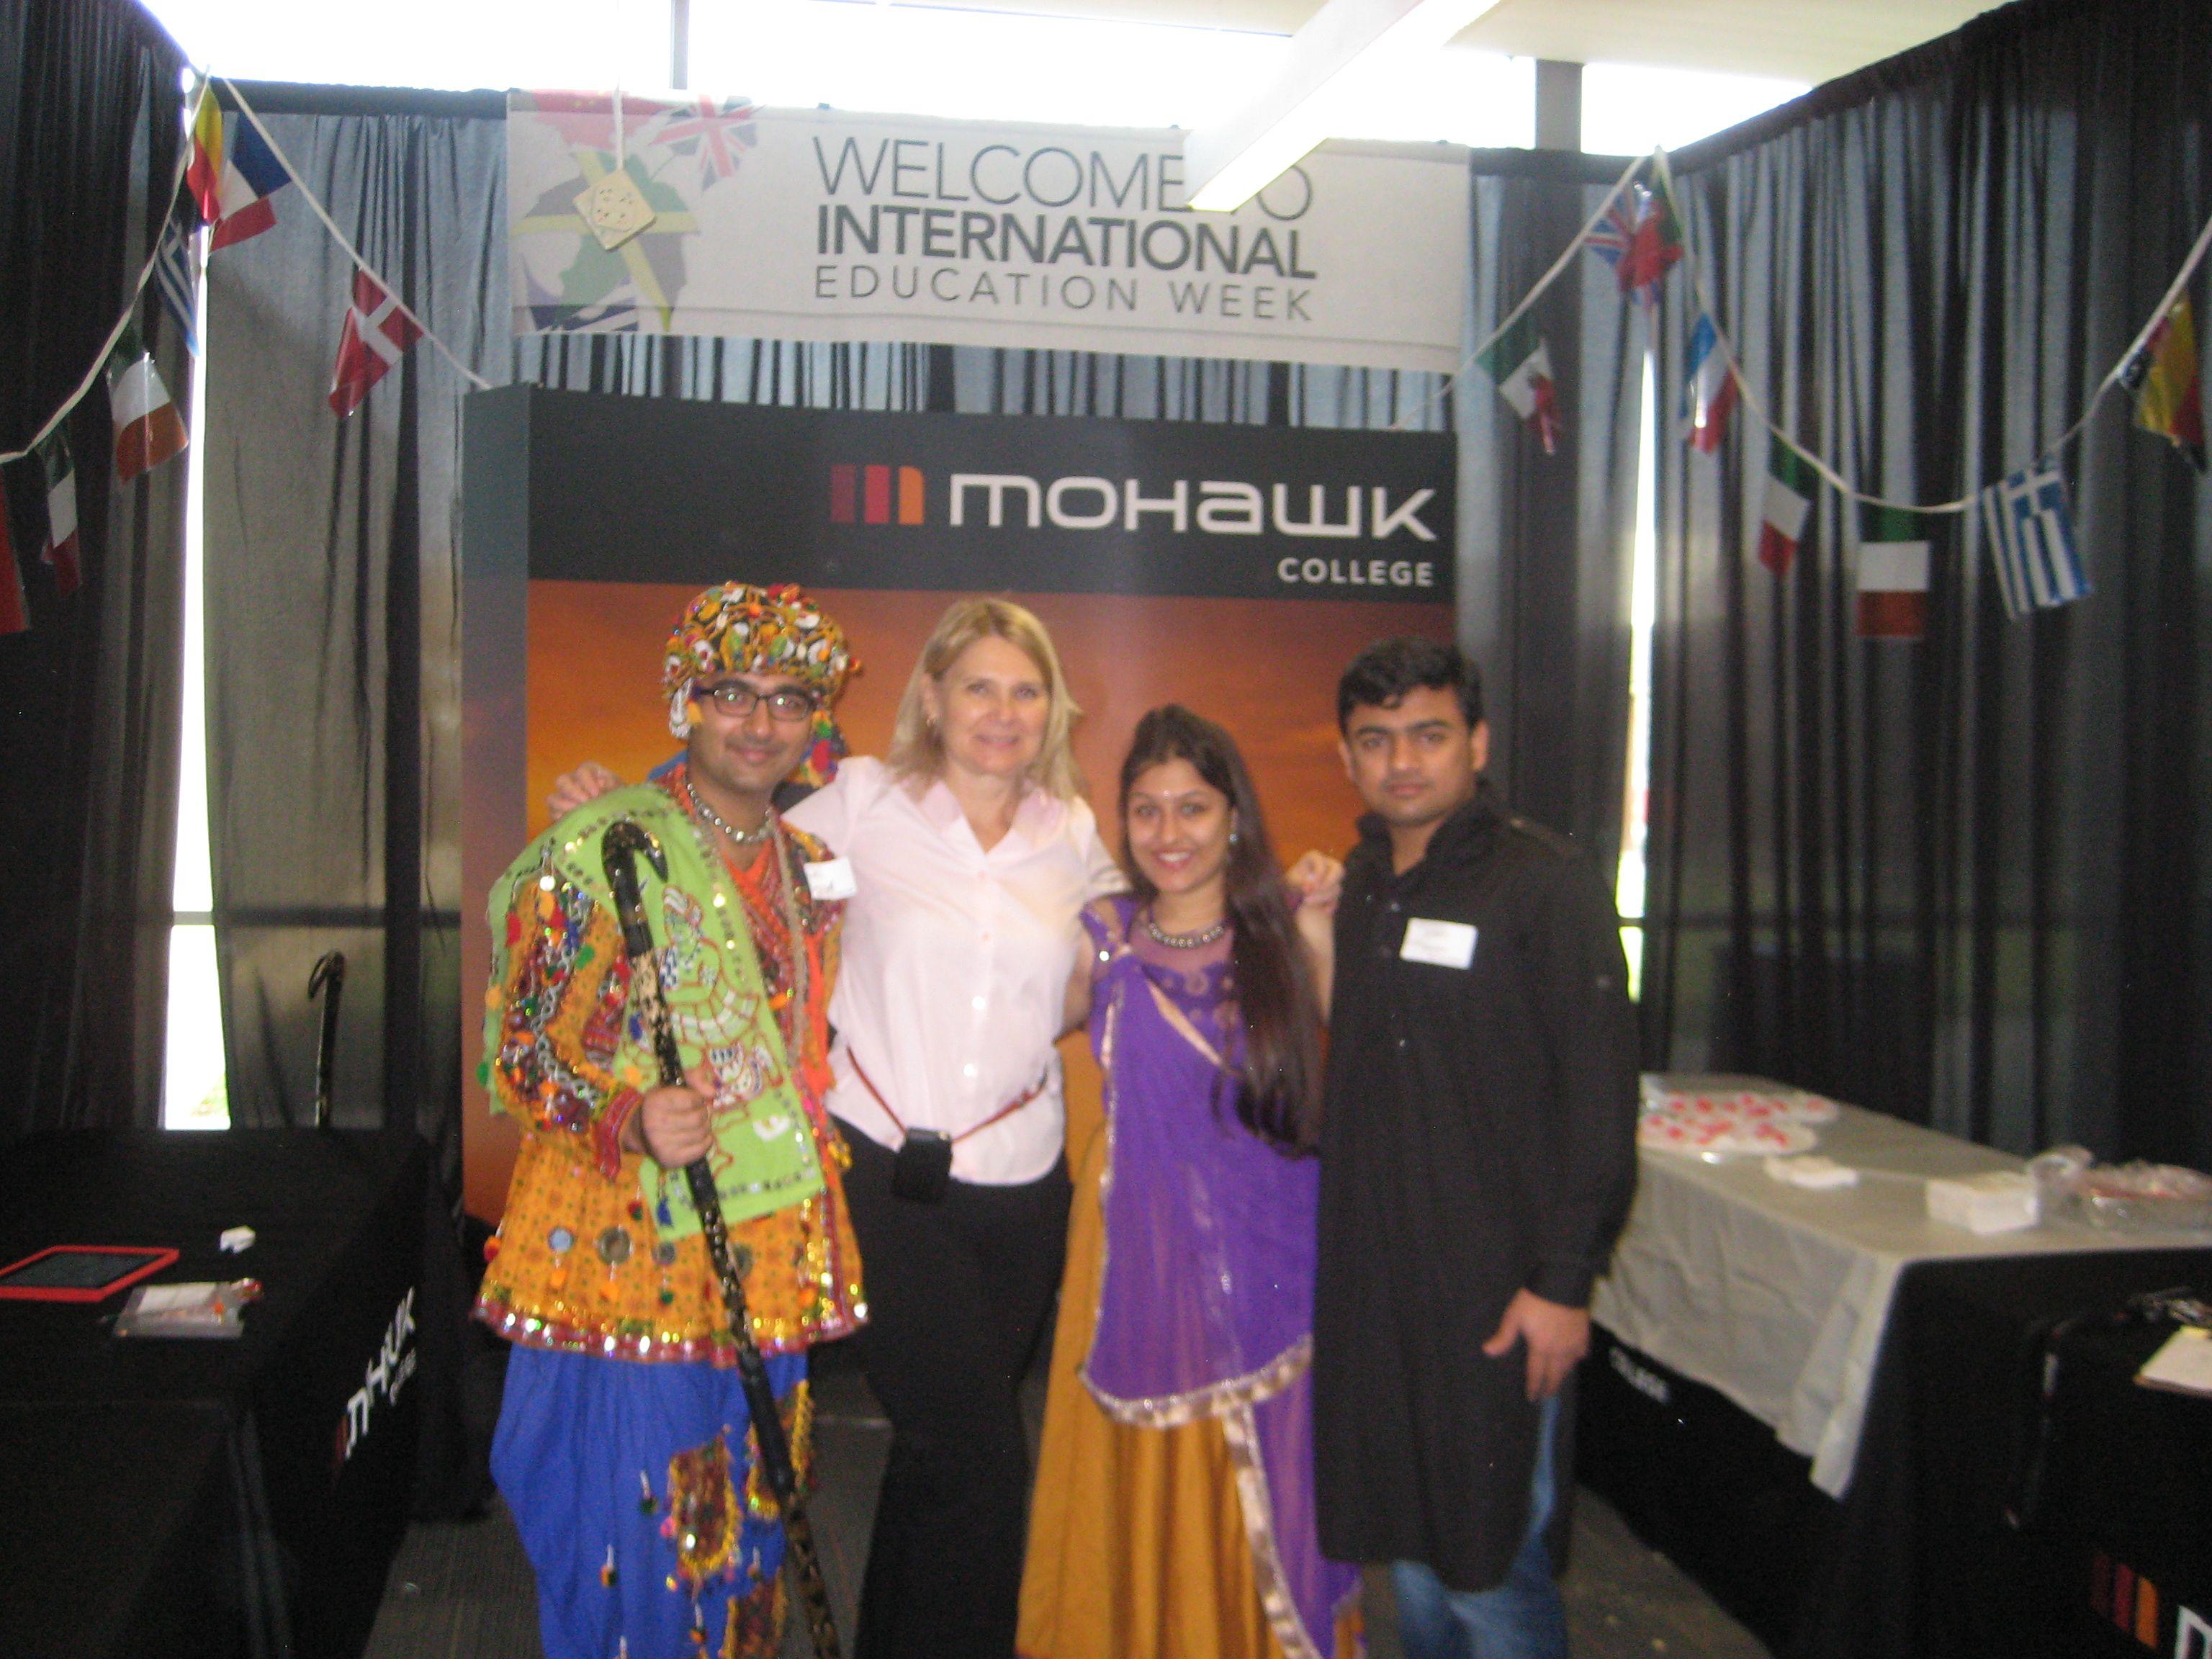 International education week at mohawk college httpwww